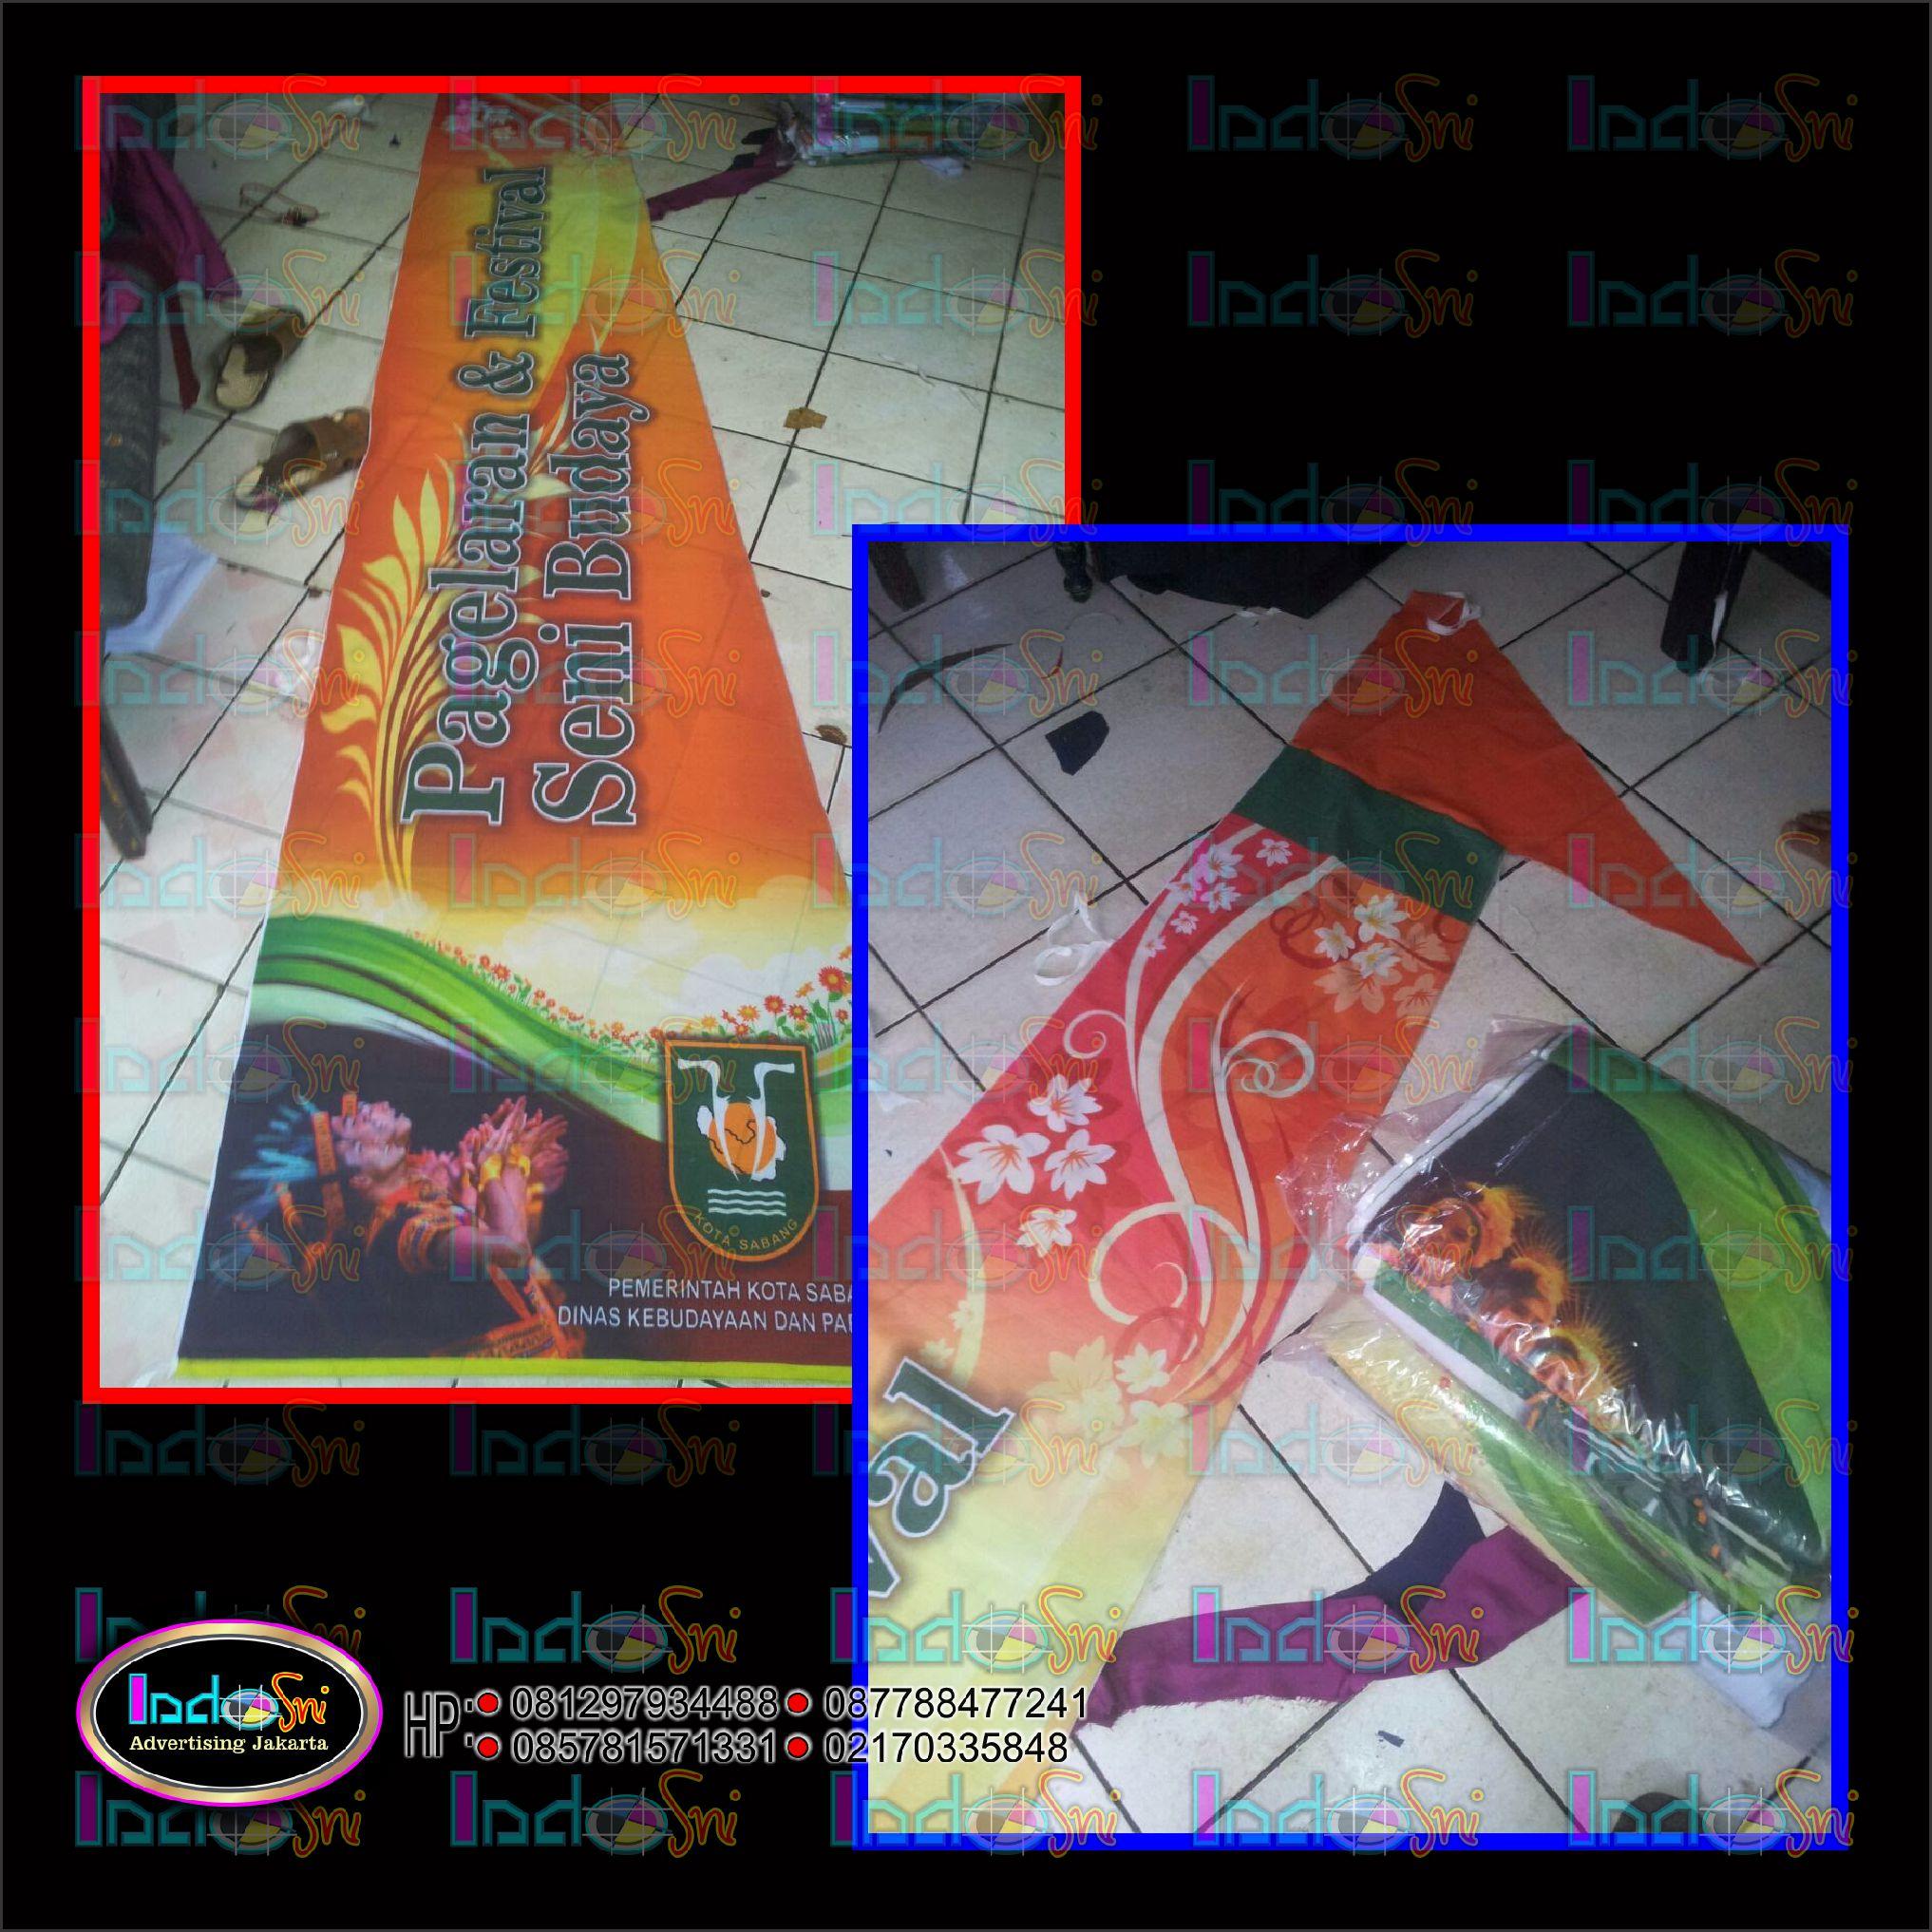 Design Gratis Umbul-umbul Kain Tetoron Digital Printing